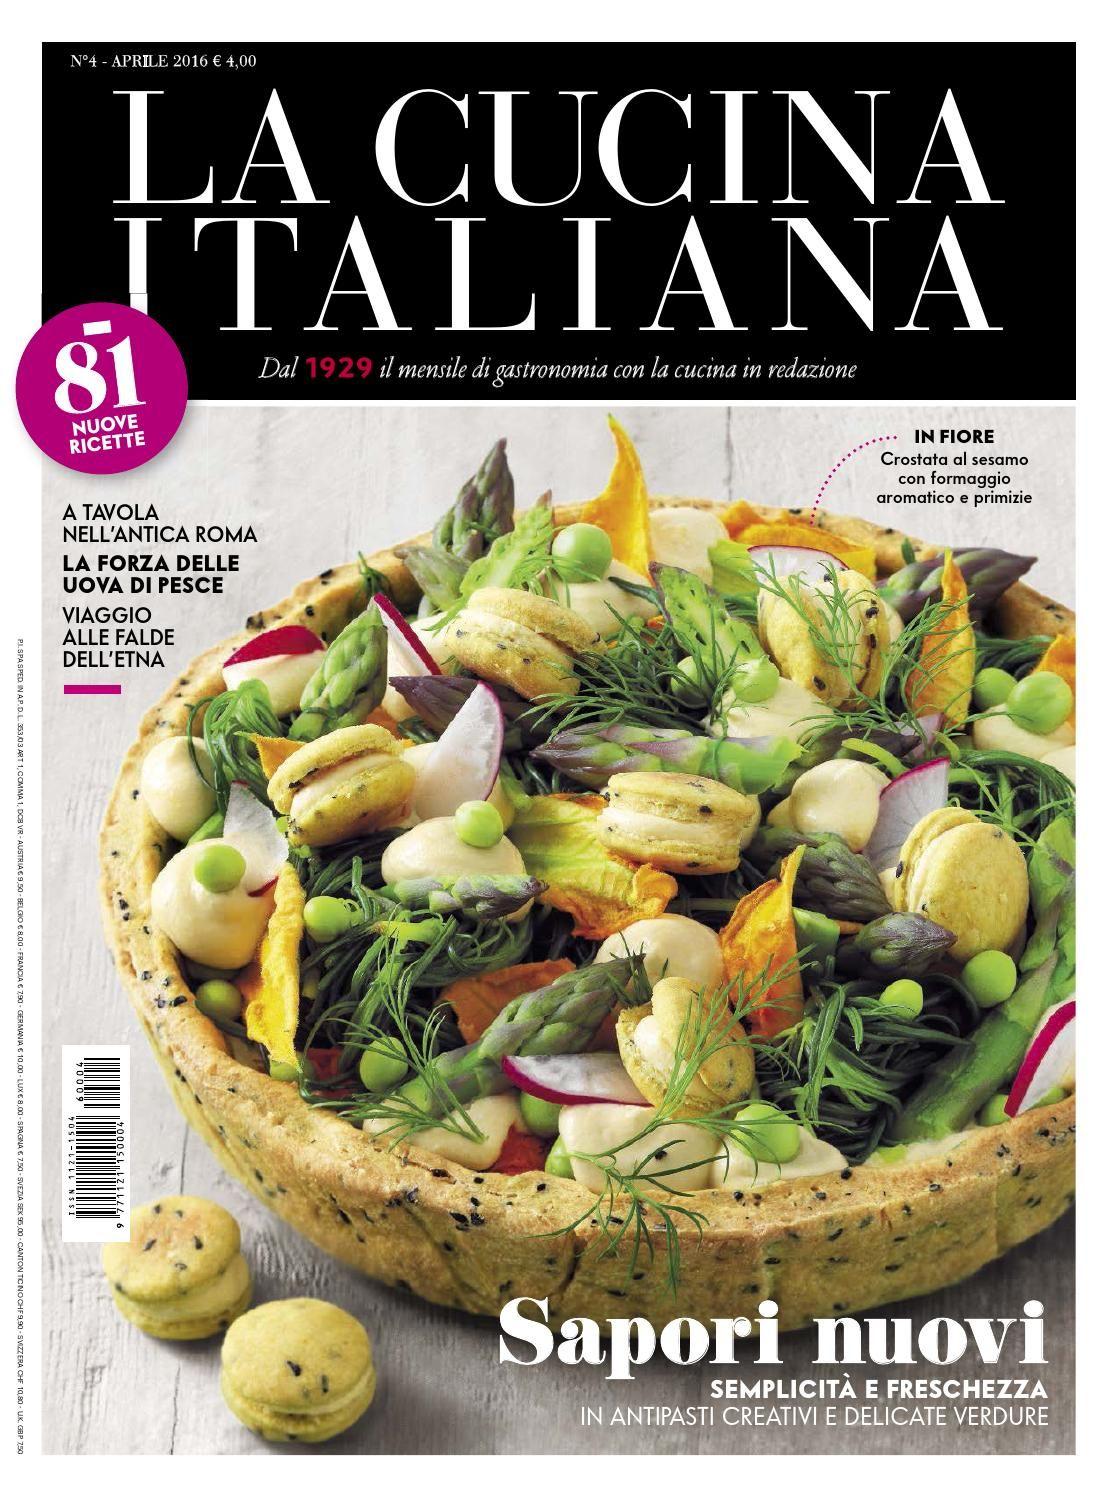 Cucina italiana ricette antipasti di pesce